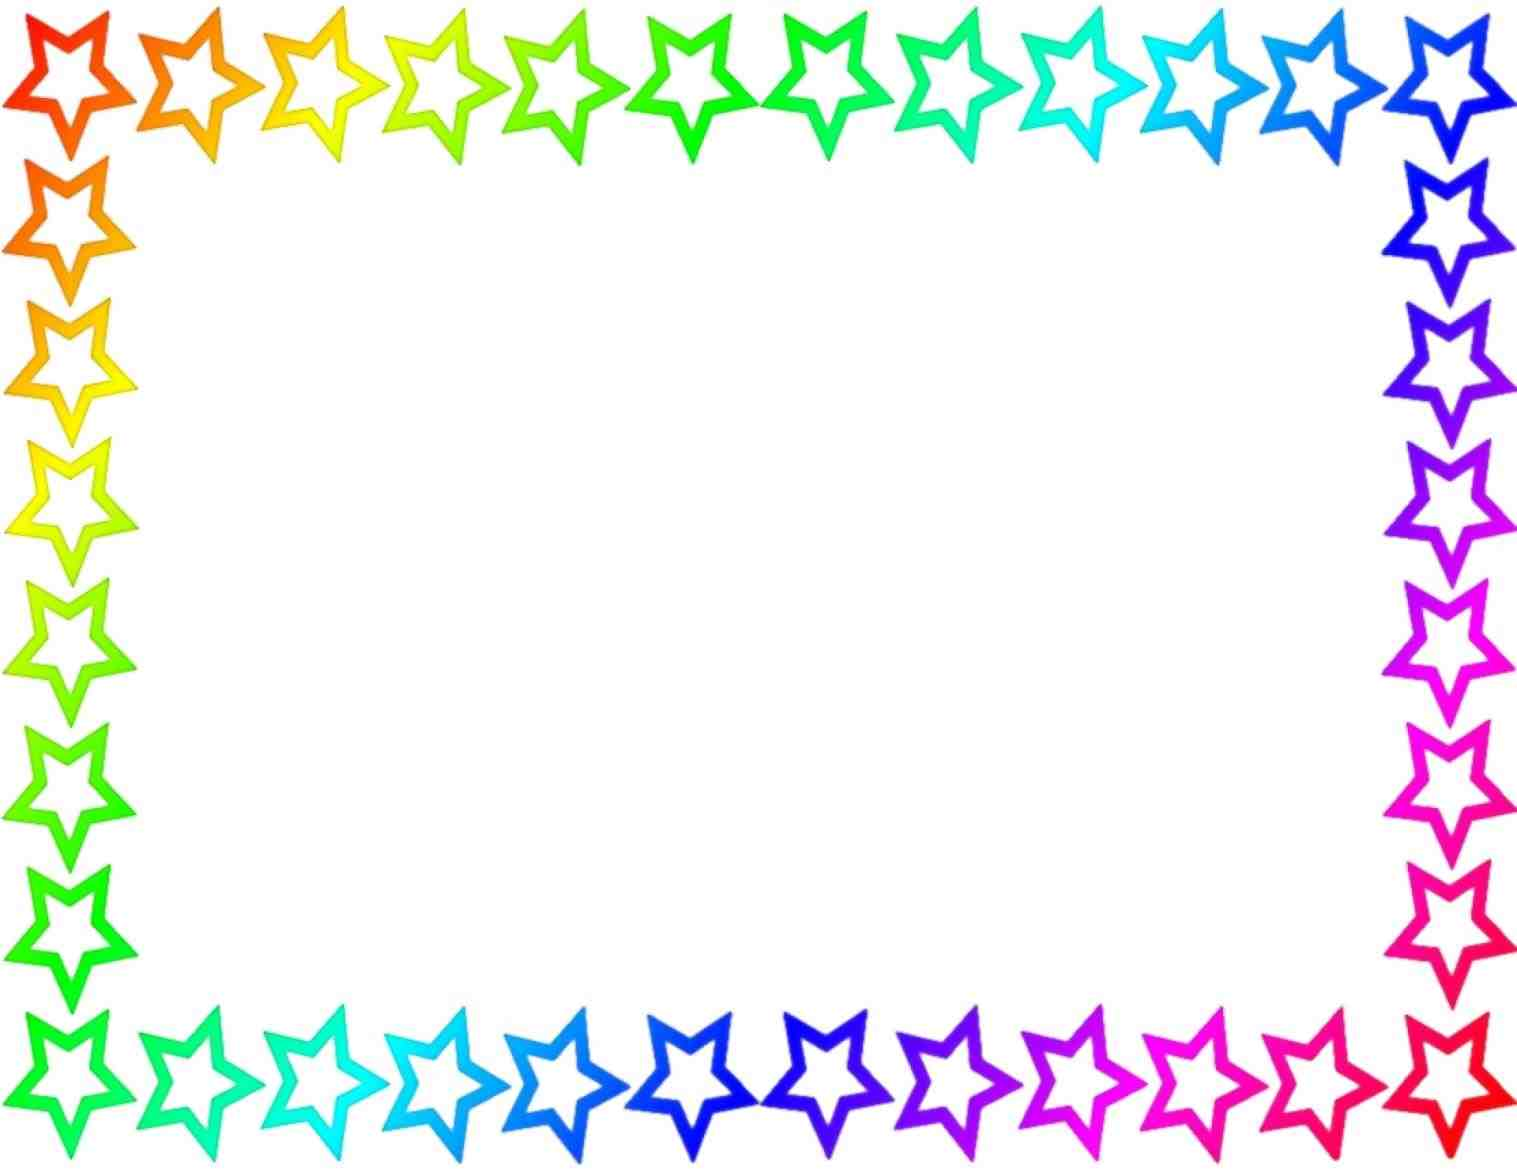 1517x1172 Christmas Tree Borders For Microsoft Word Cheminee.website